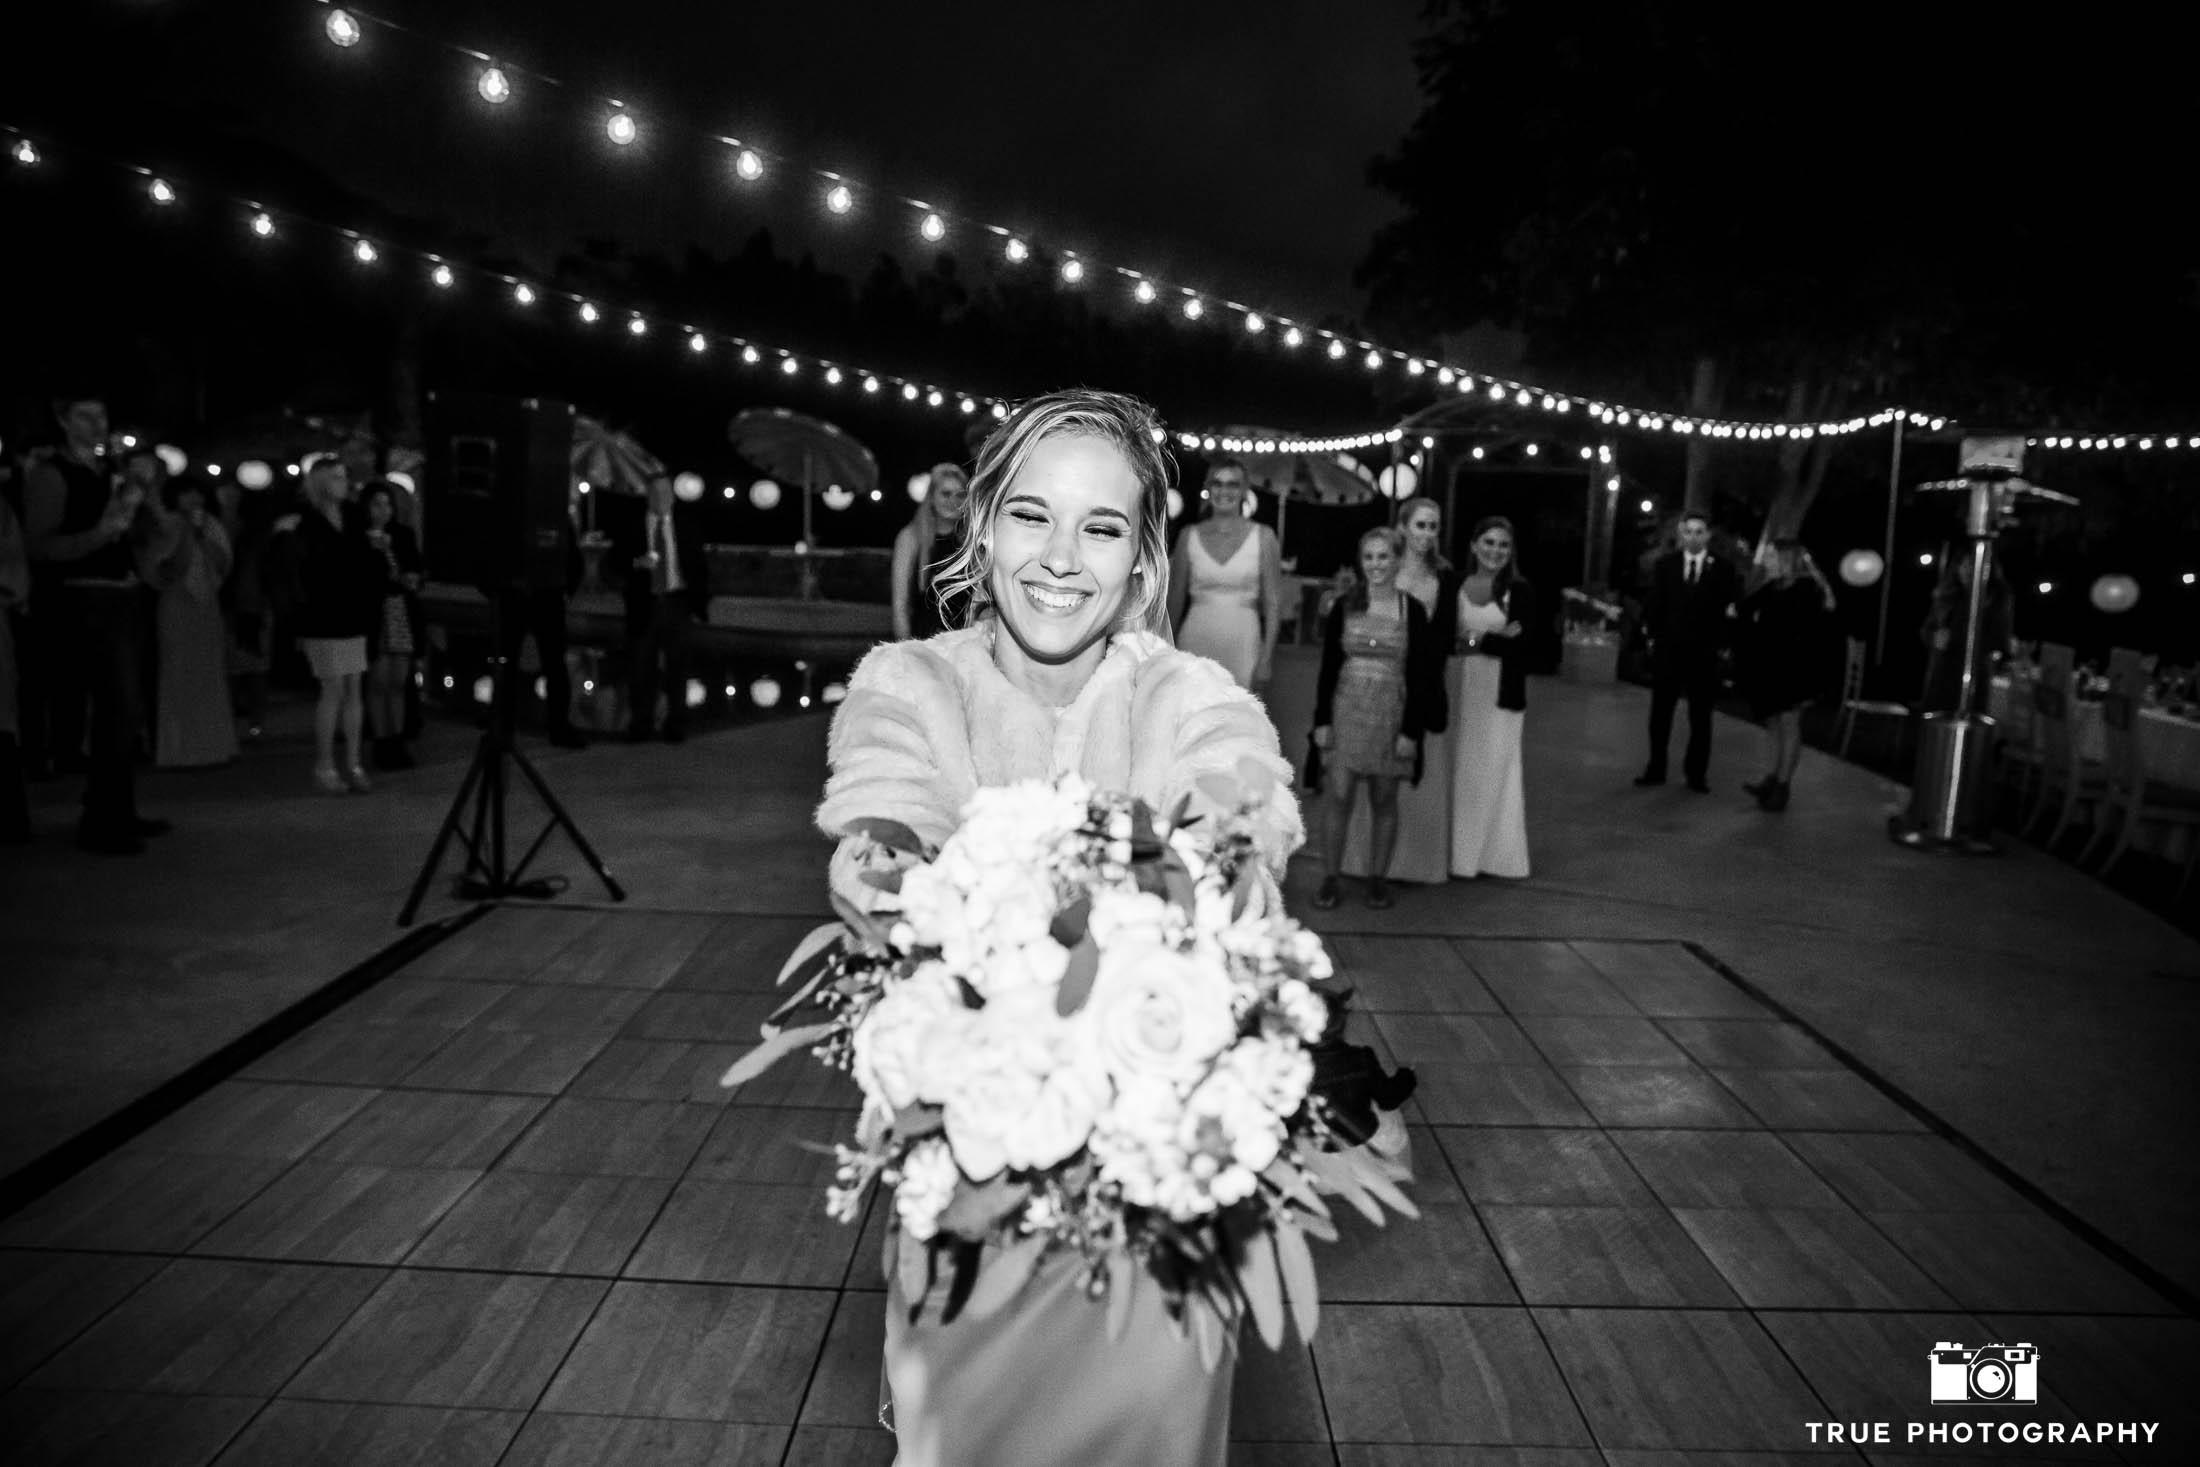 Bride prepares to toss bouquet during outdoor reception